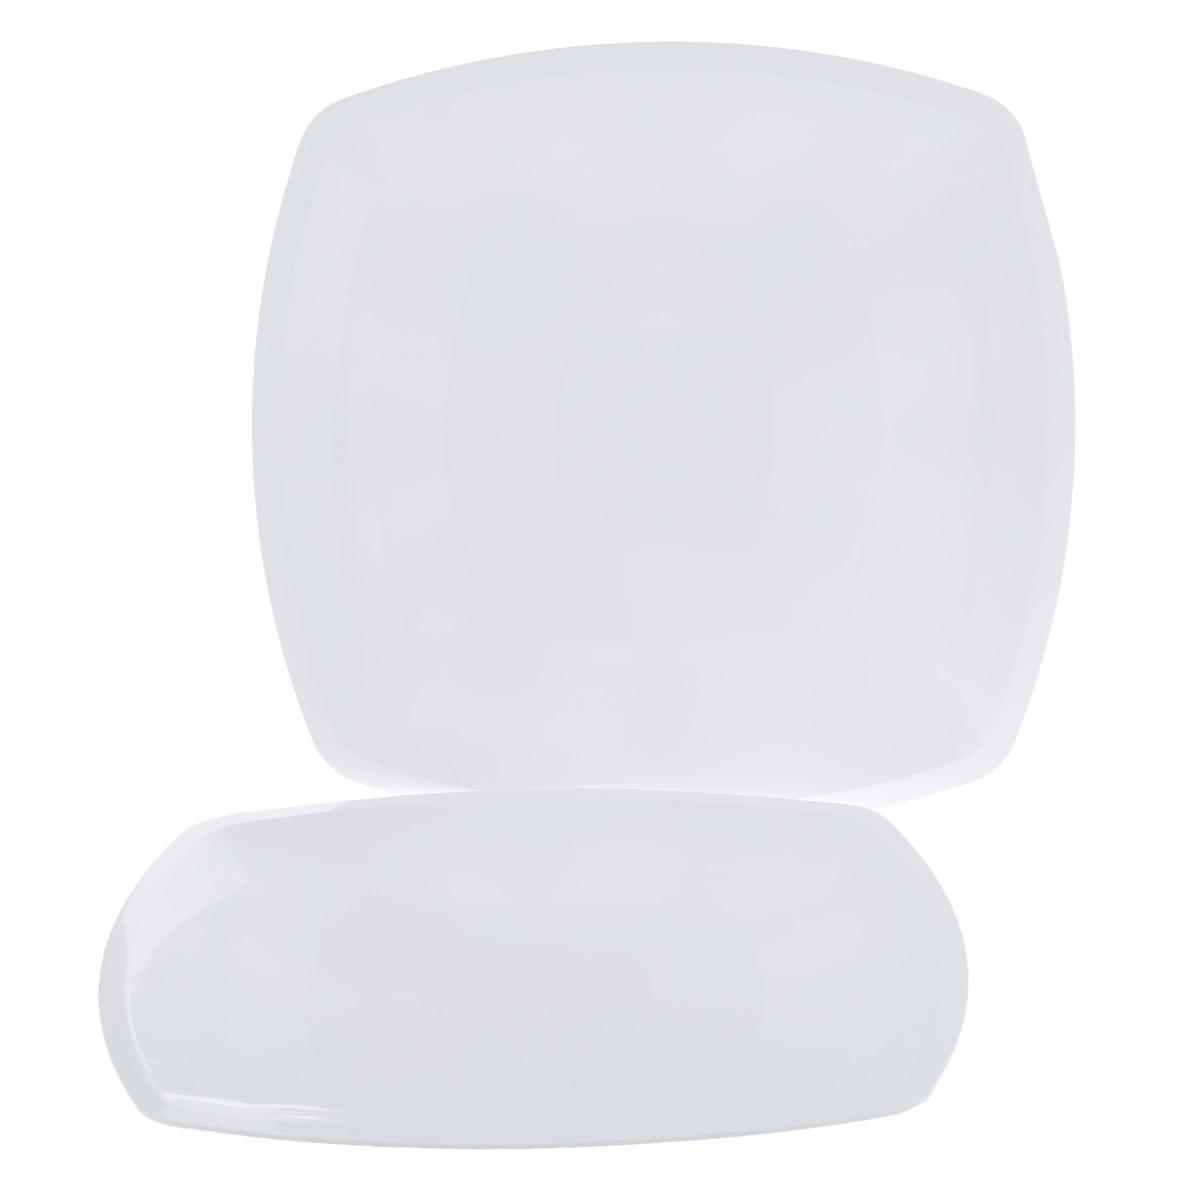 "Набор одноразовых тарелок ""Buffet"", цвет: белый, 30 х 30 см, 3 шт"